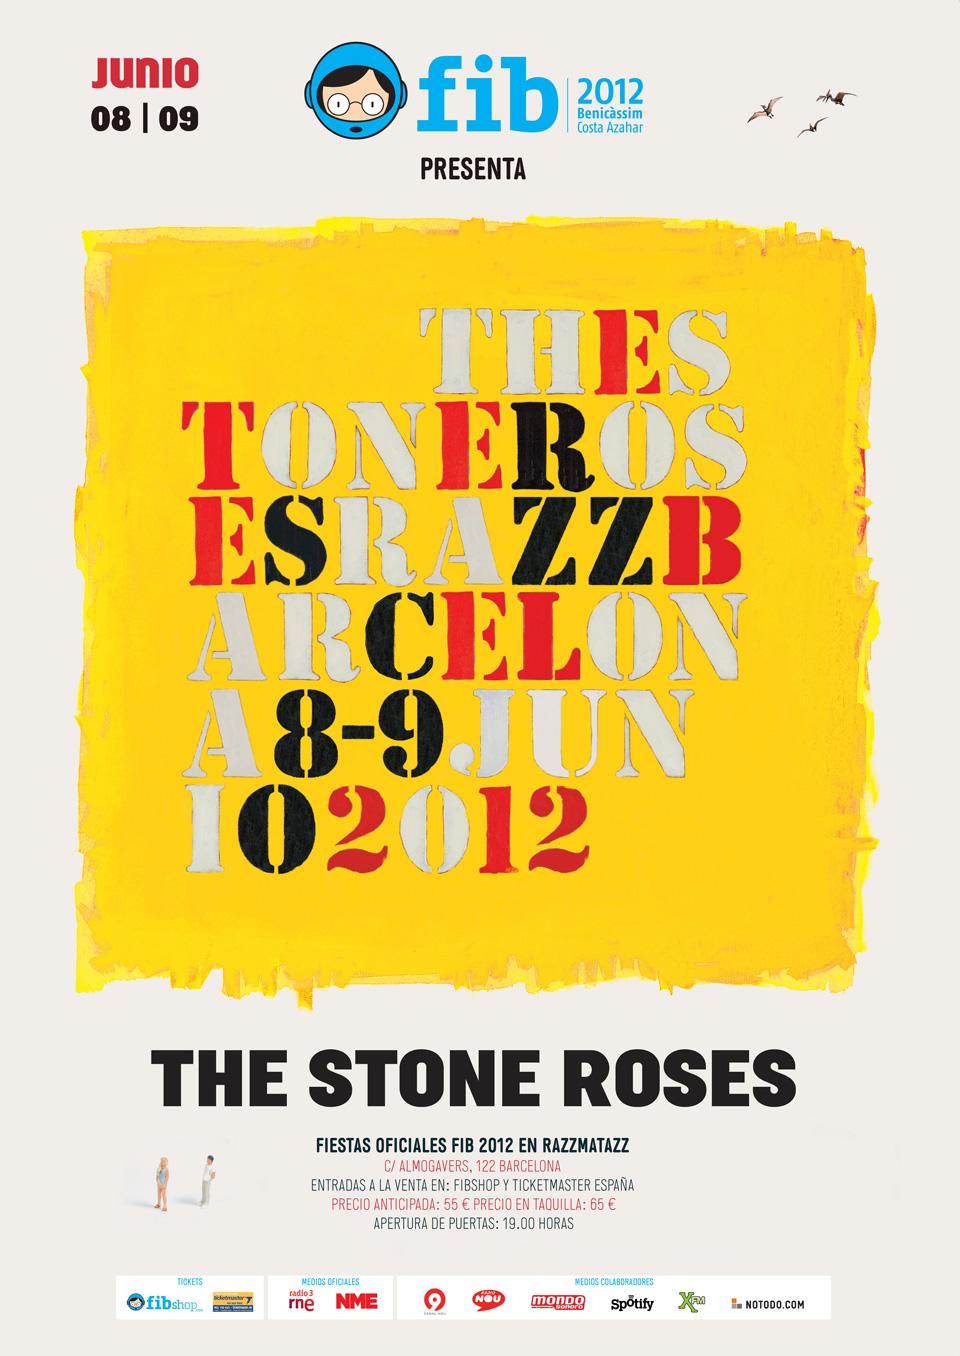 The Stone Roses FIB